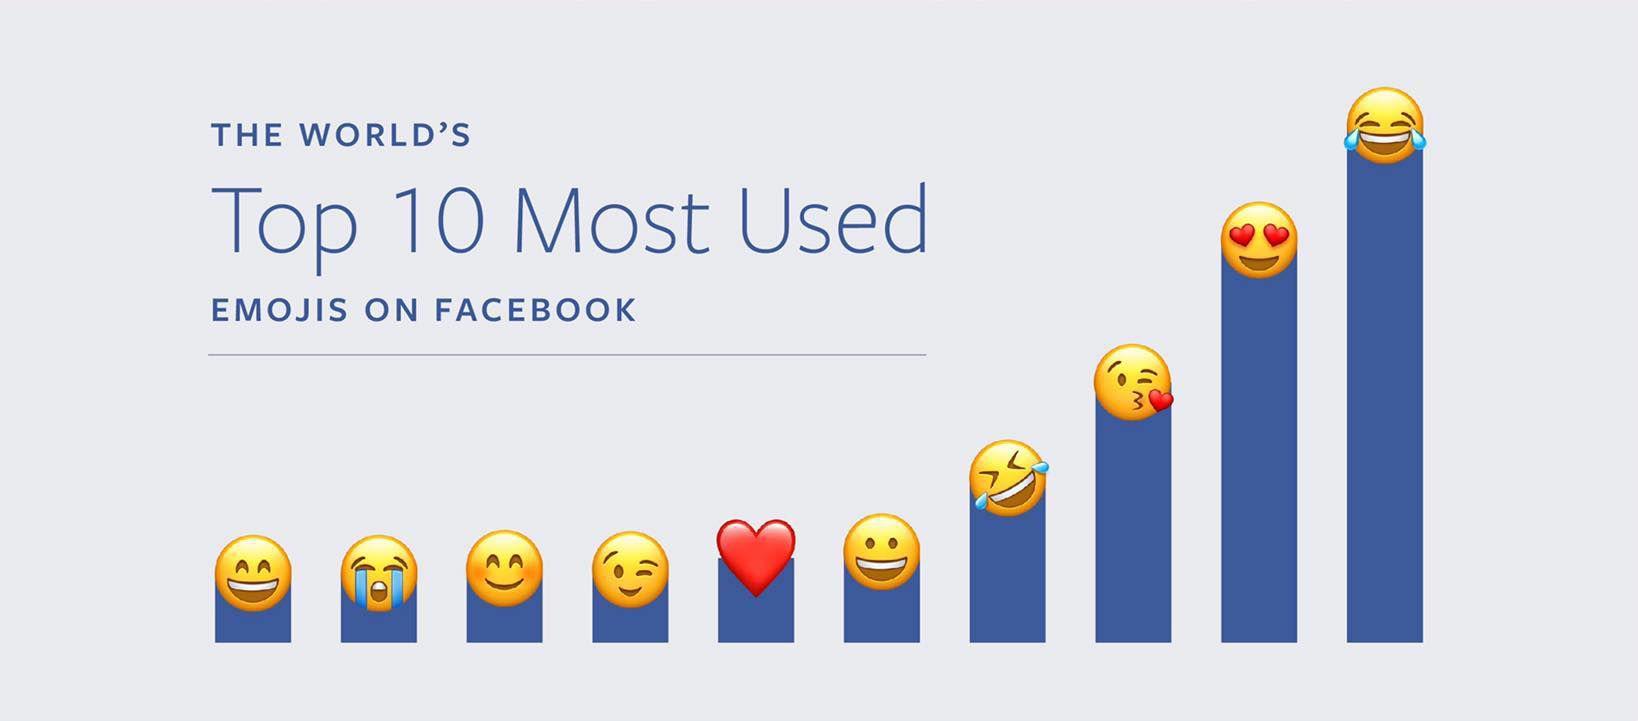 postare su facebook emoji